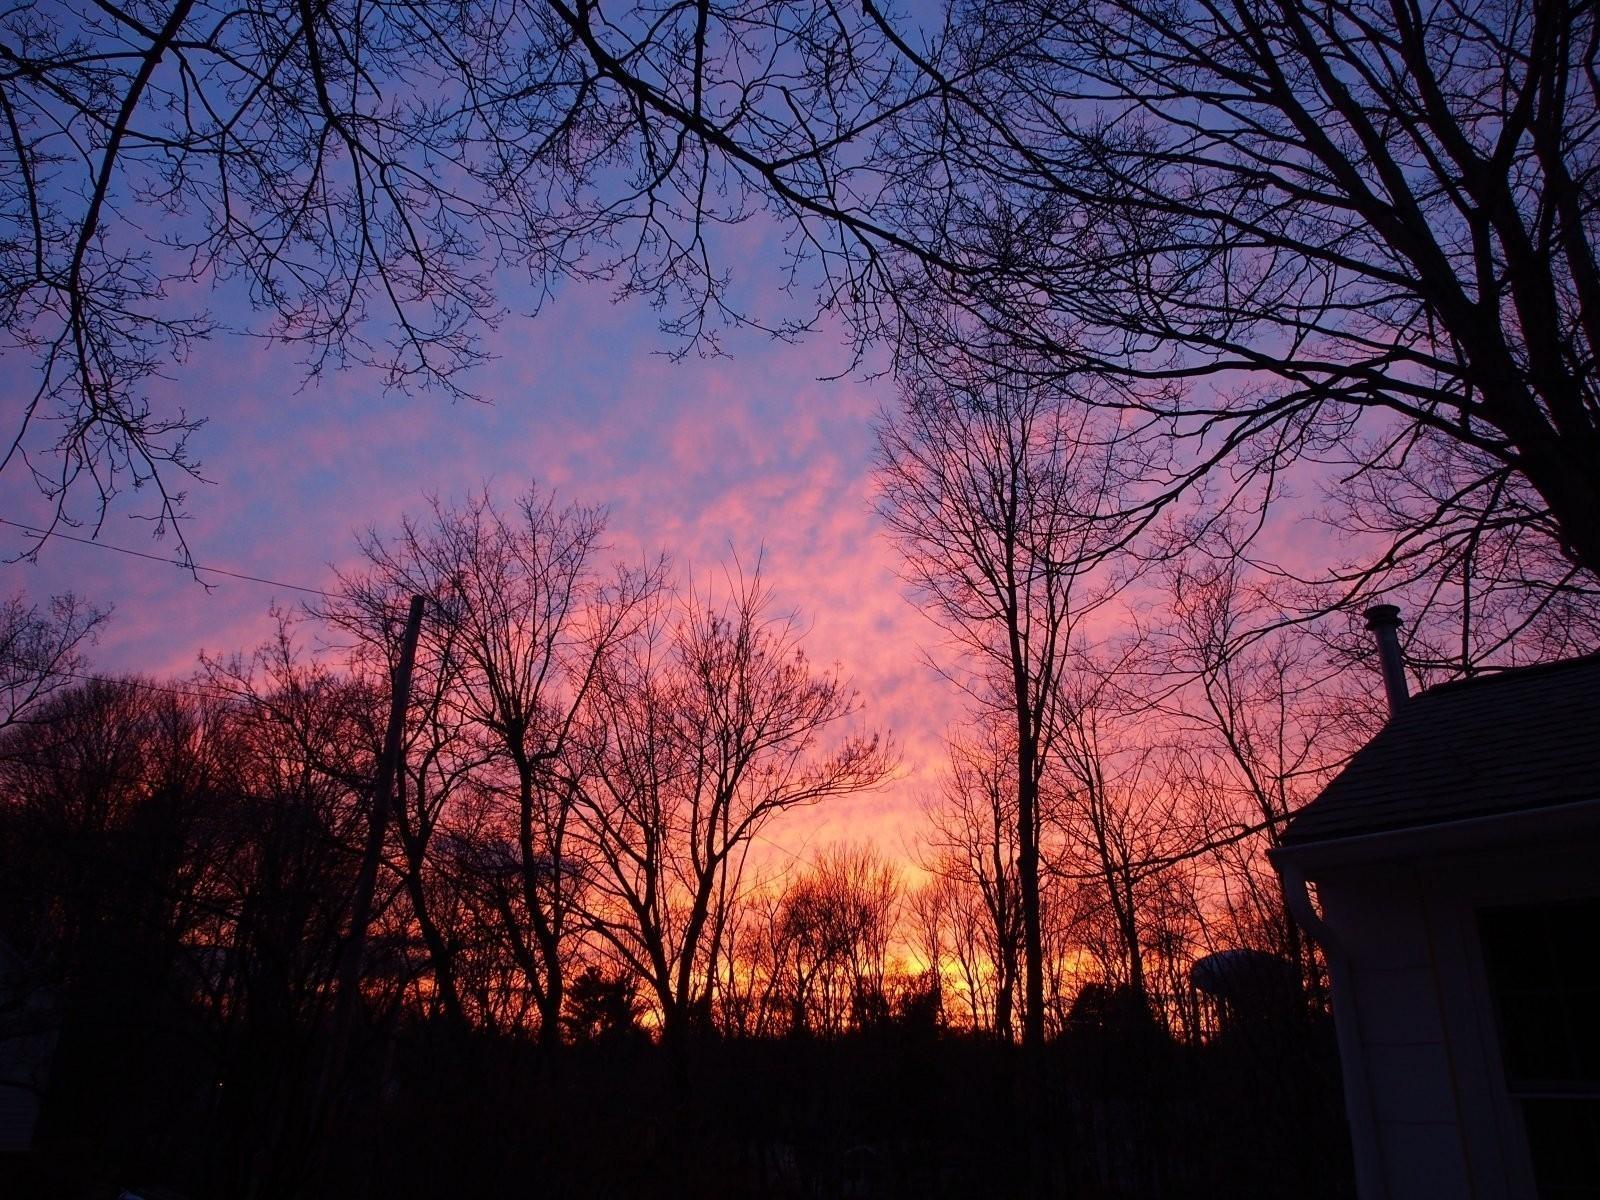 OMD Pickering Lane amazing sunset 017.JPG